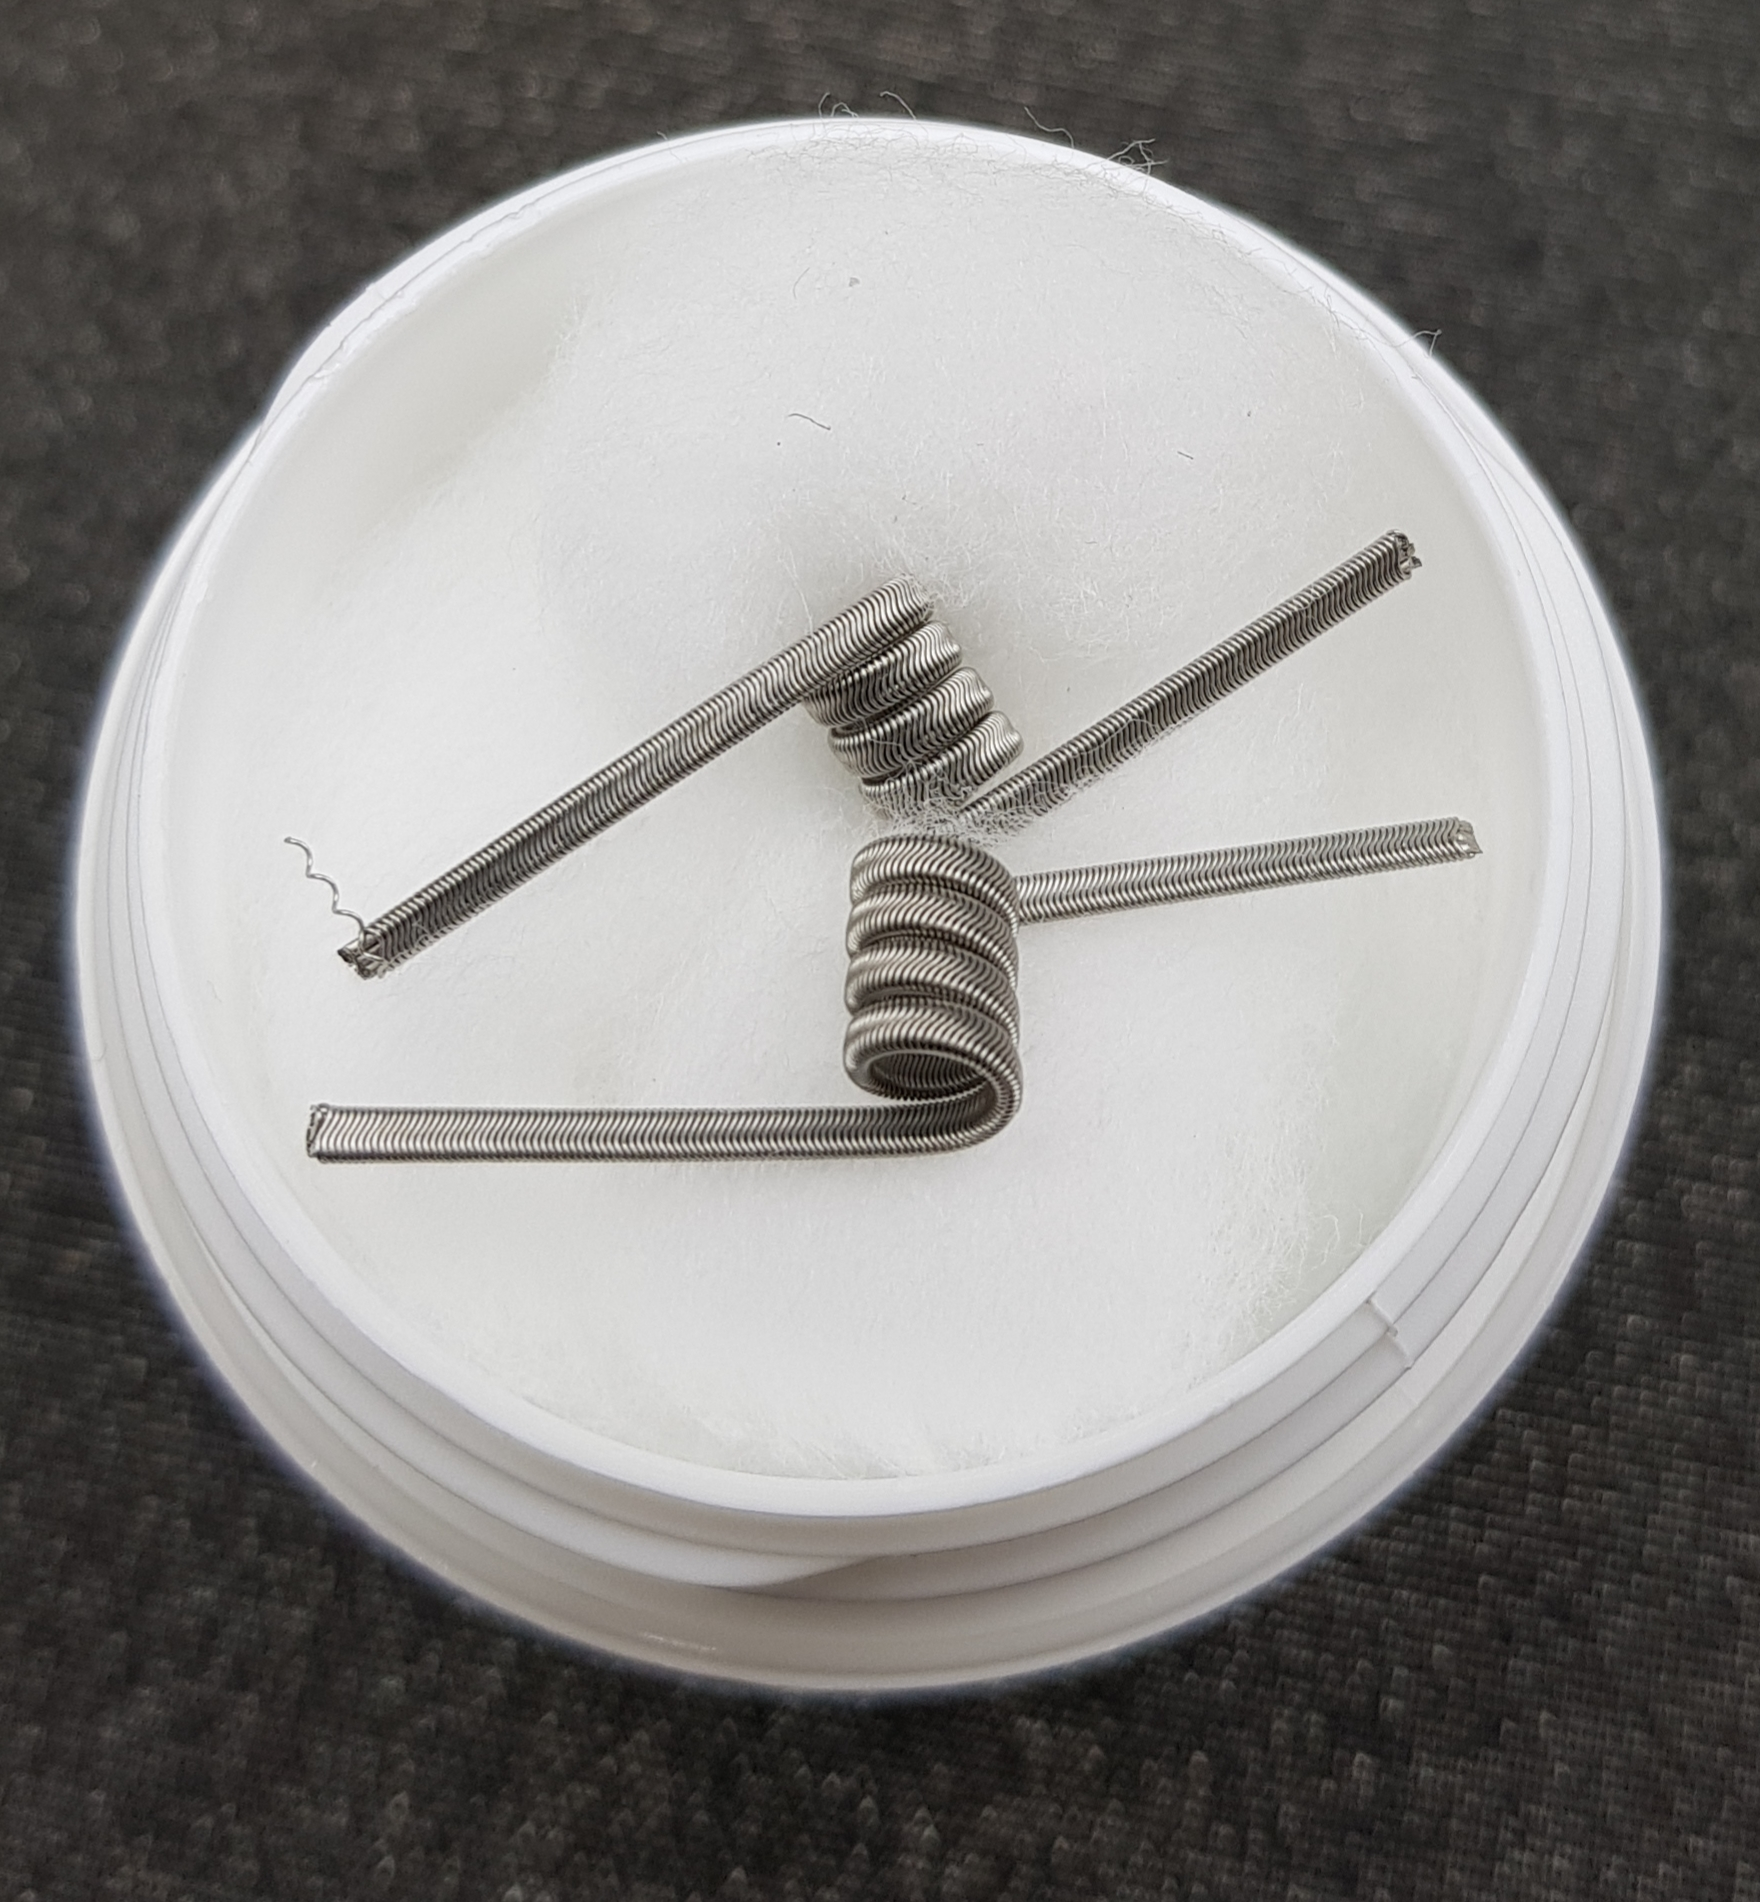 1.3 ohm single coil